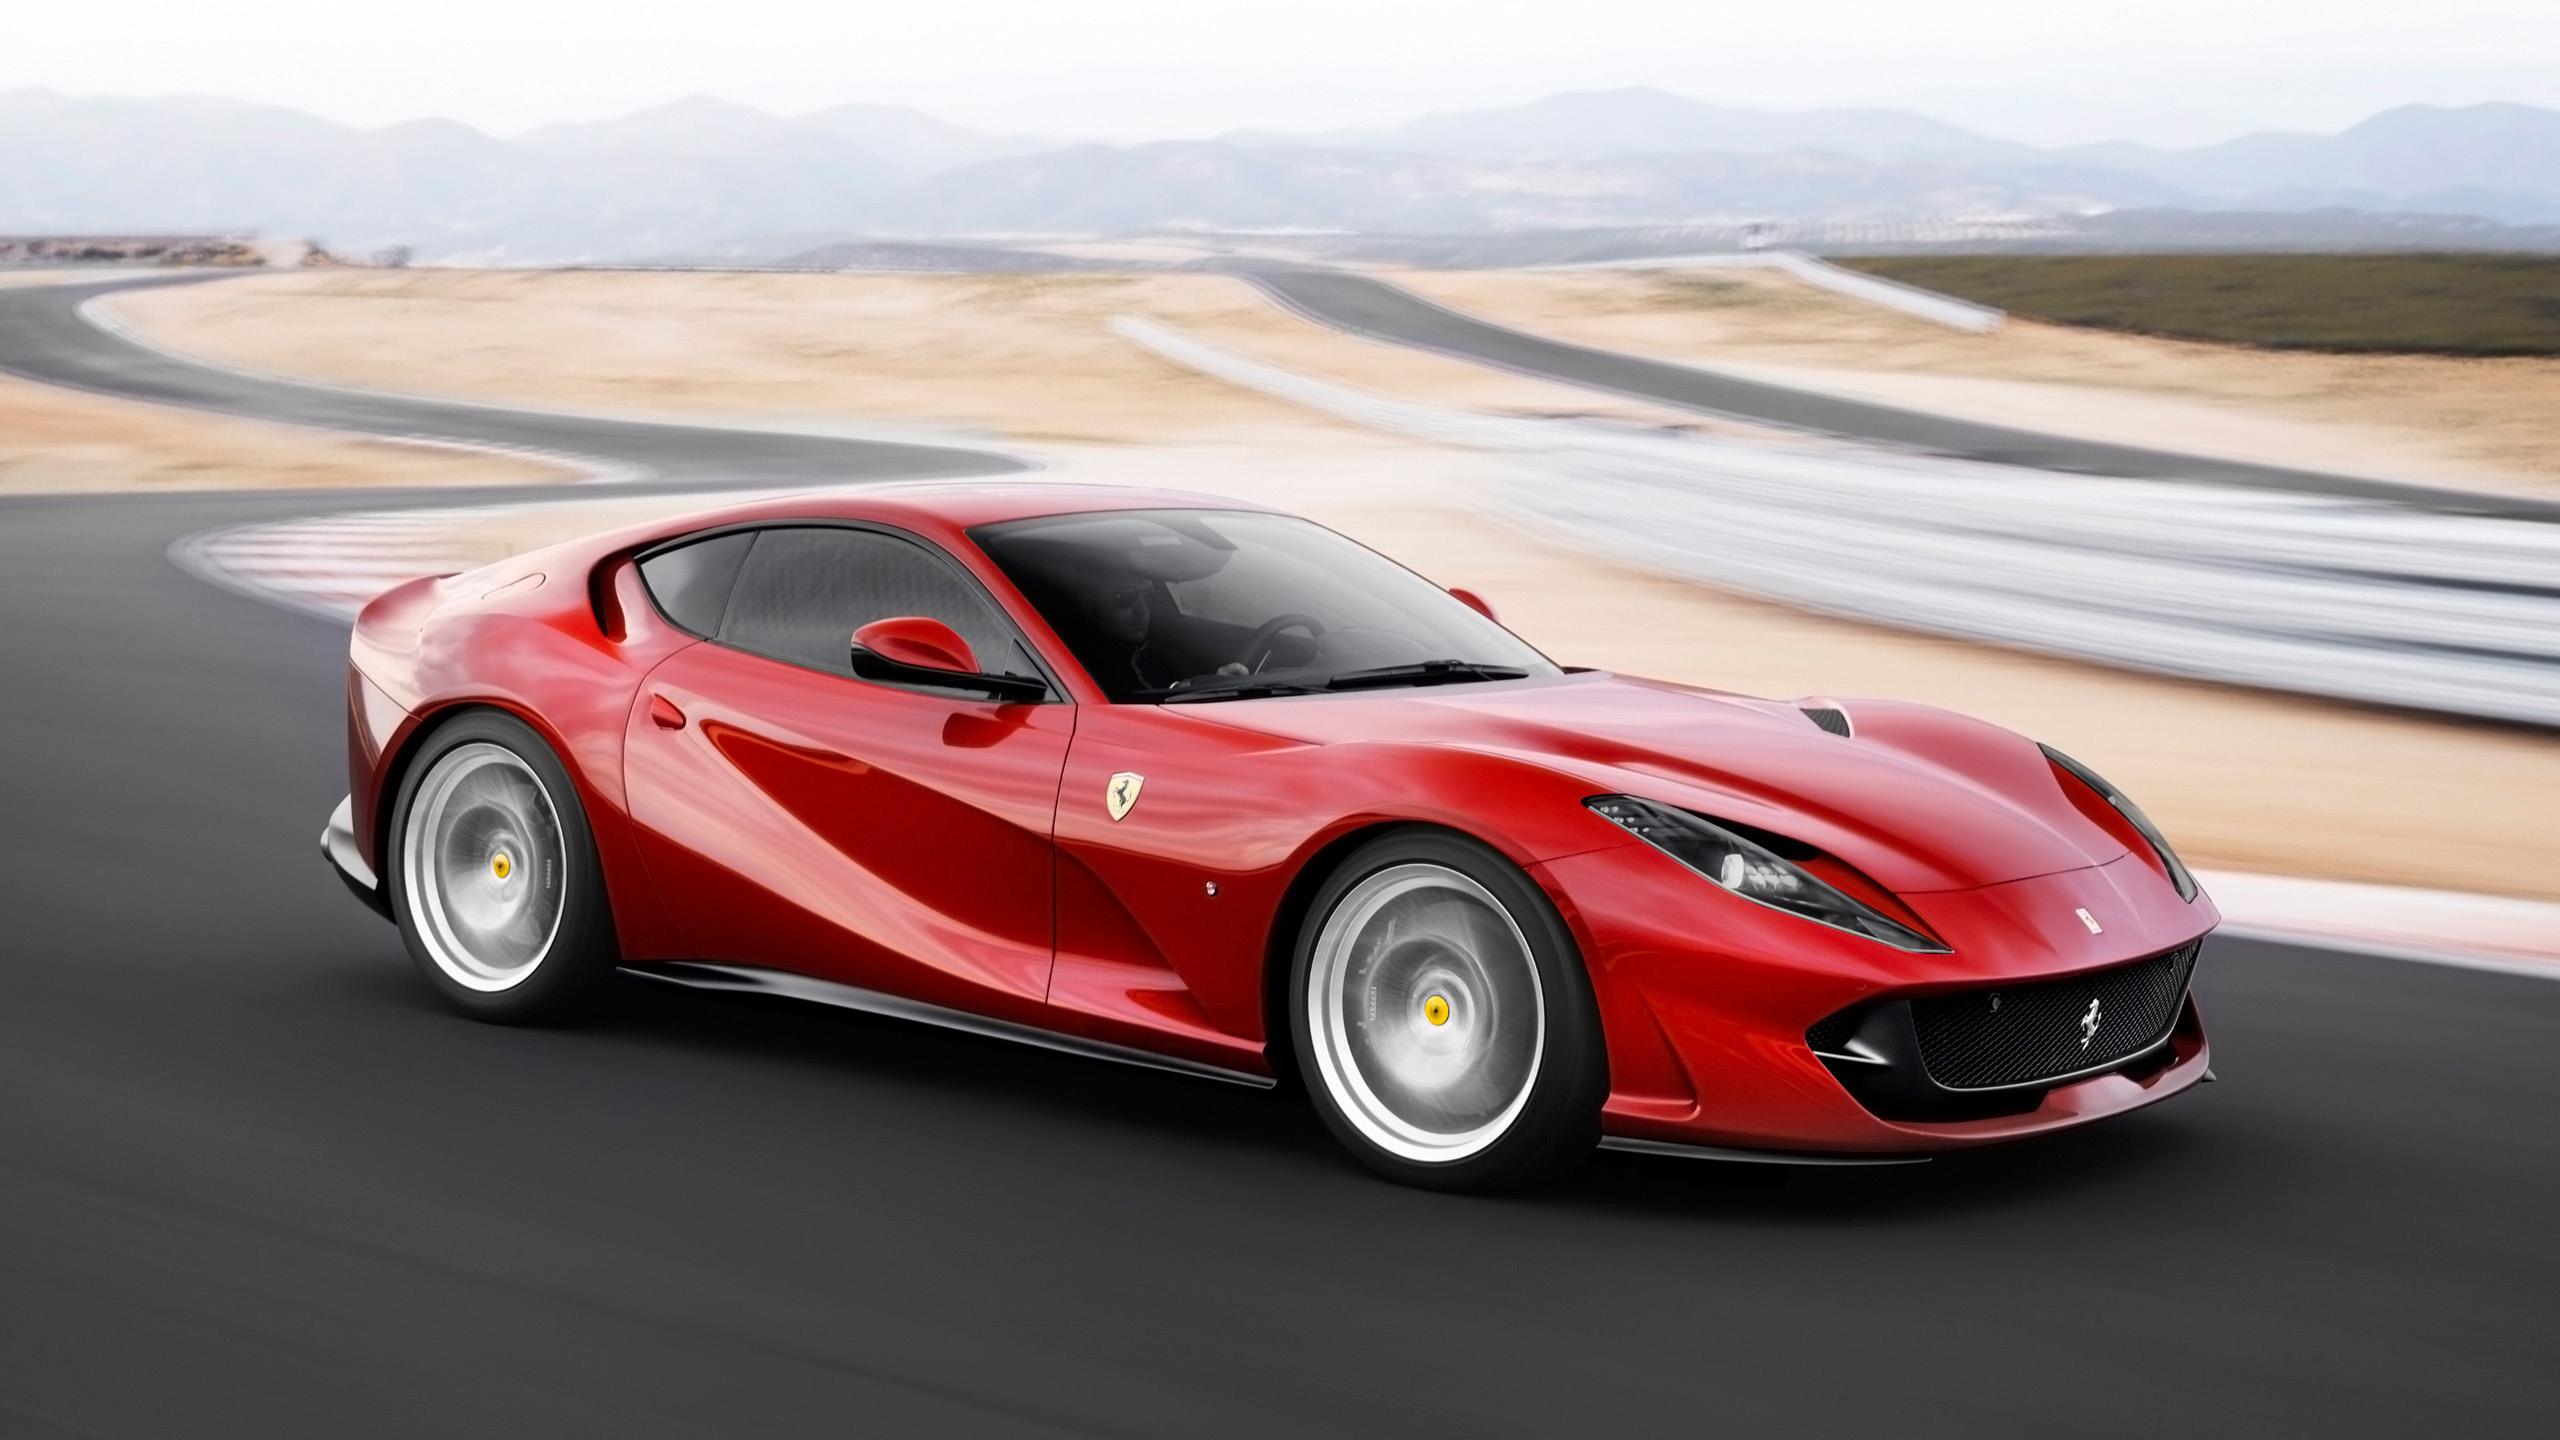 Lamborghini Car Wallpaper Hd Download Ferrari 812 Superfast 2017 Wallpaper Hd Car Wallpapers